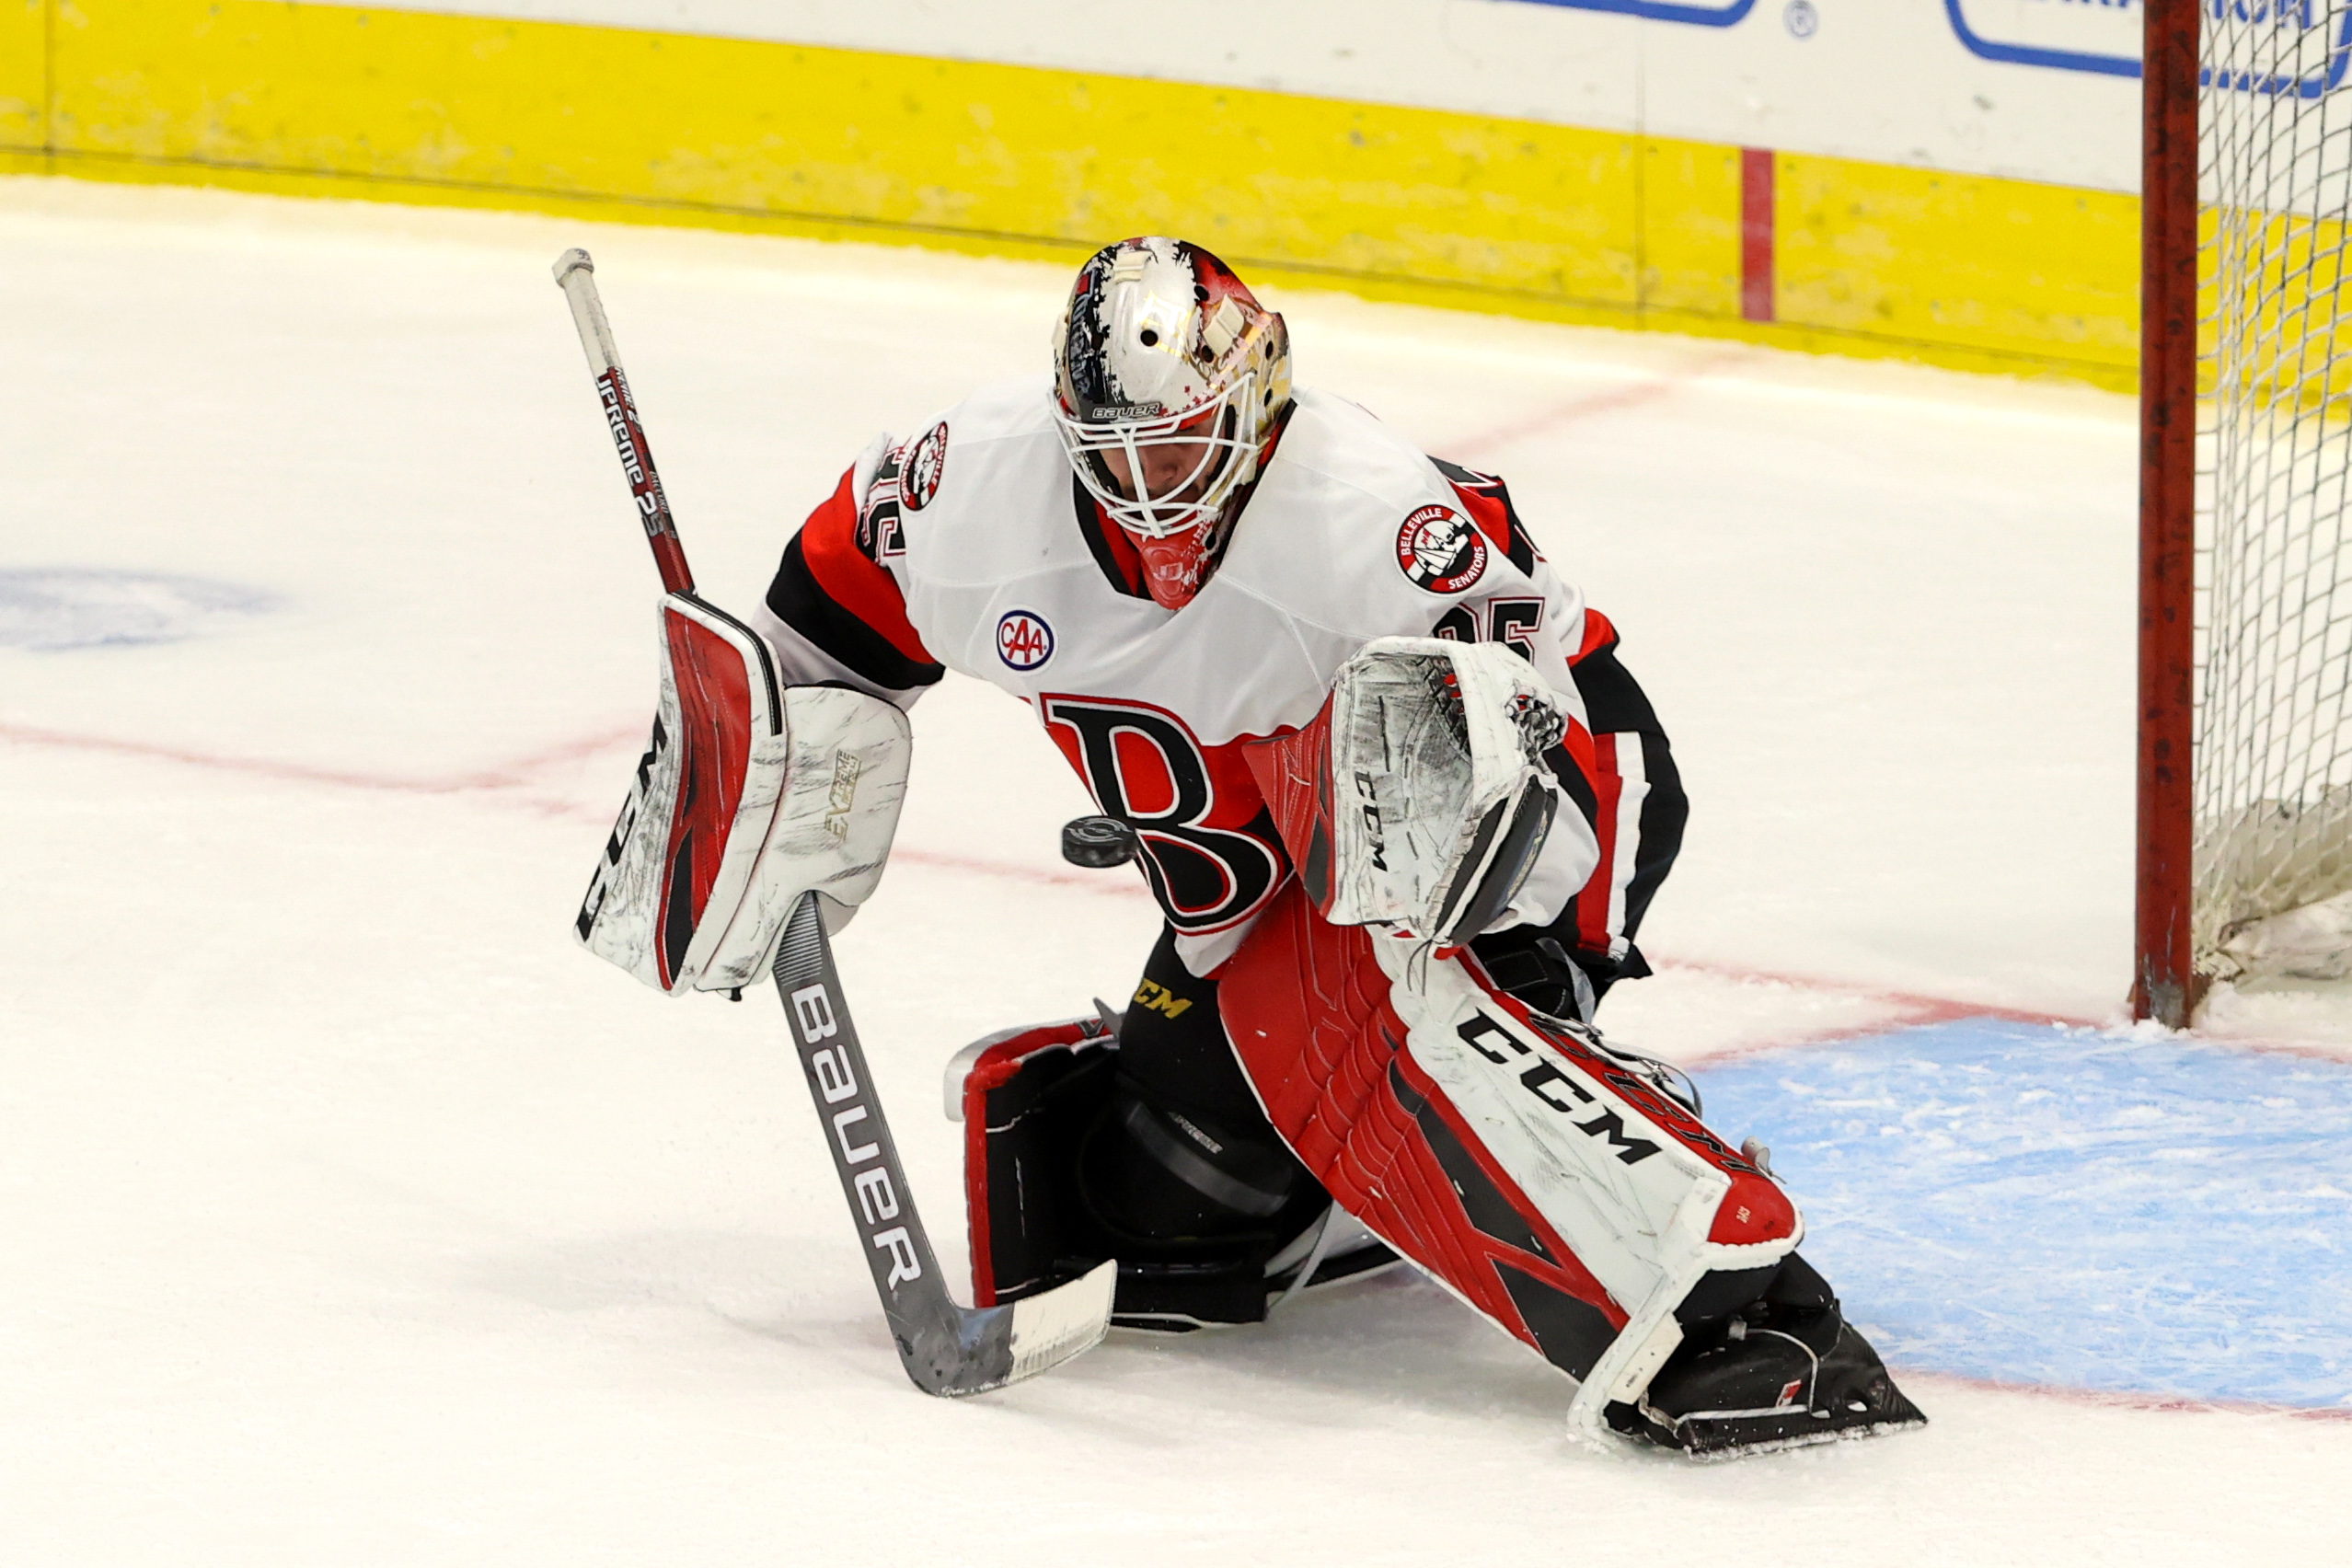 AHL: FEB 28 Belleville Senators at Cleveland Monsters